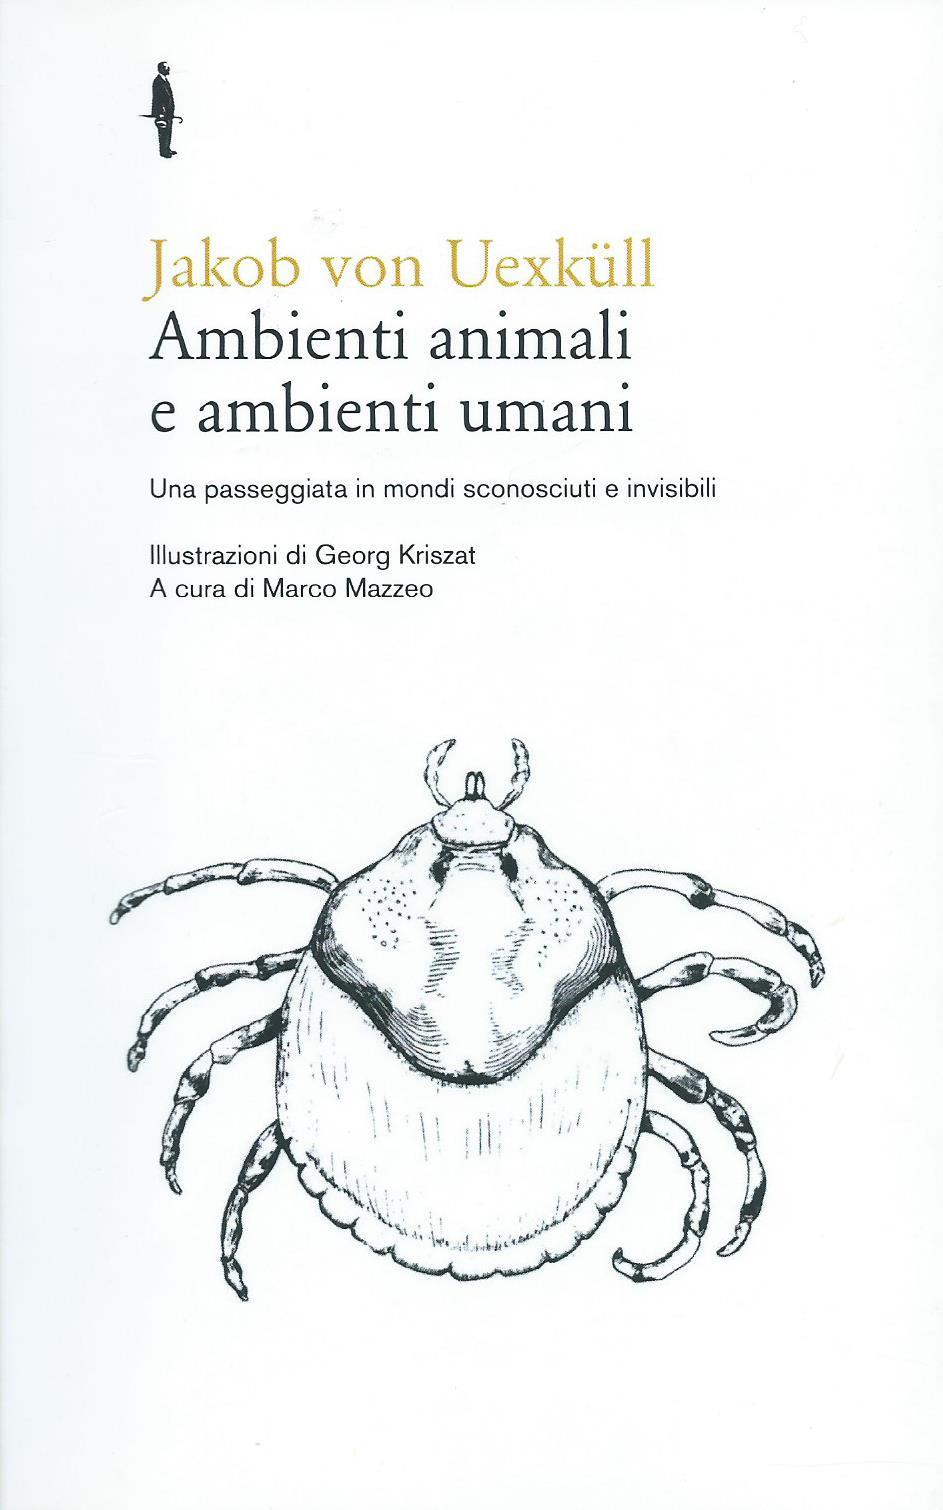 Jakob Von Uexkull, Ambienti animali e ambienti umani